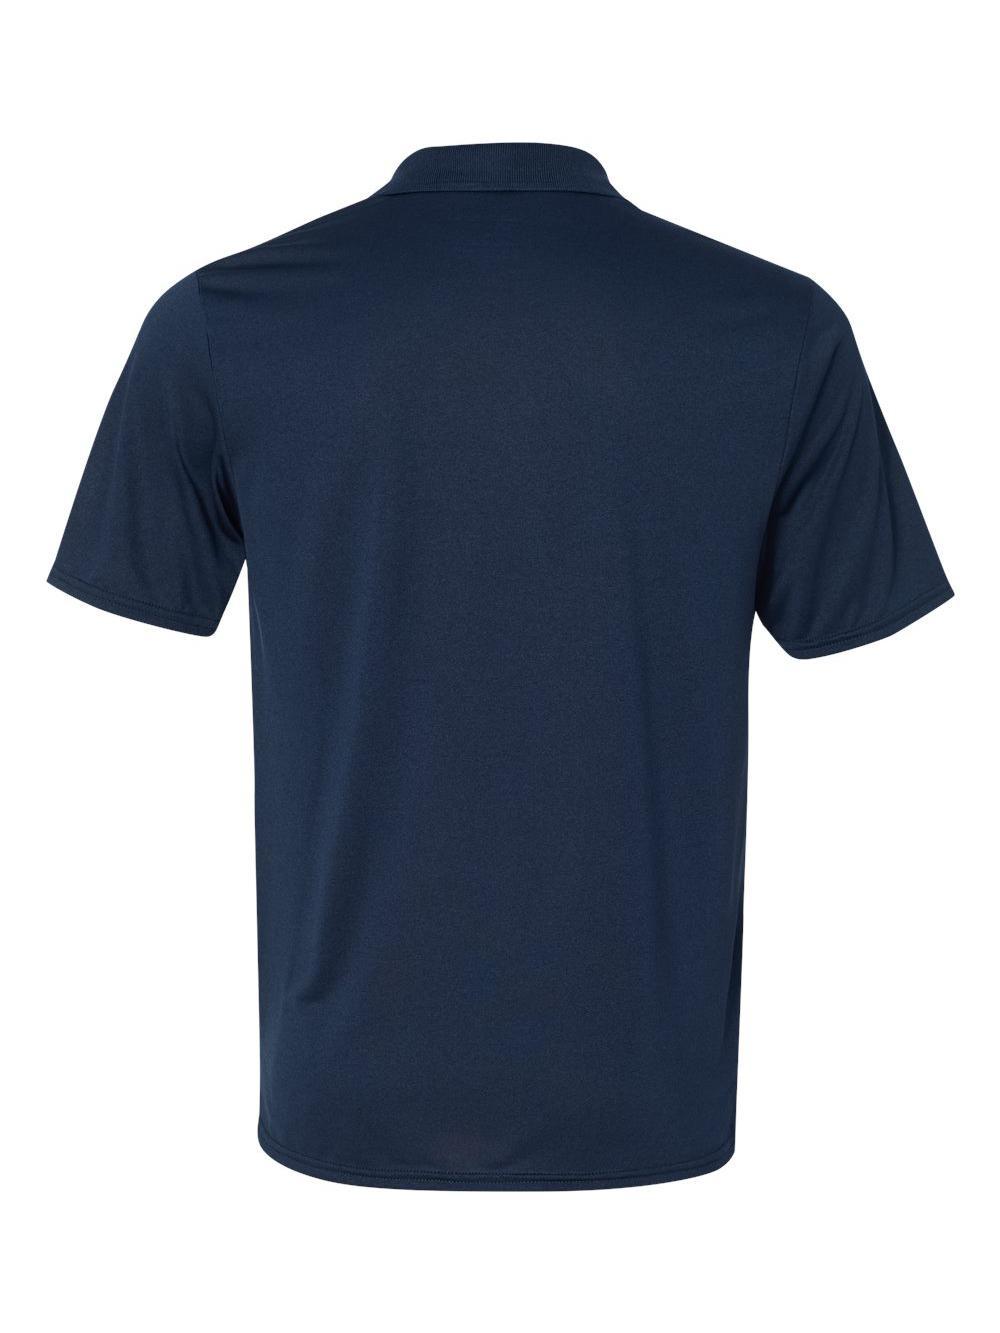 Gildan-Performance-Jersey-Sport-Shirt-44800 thumbnail 16